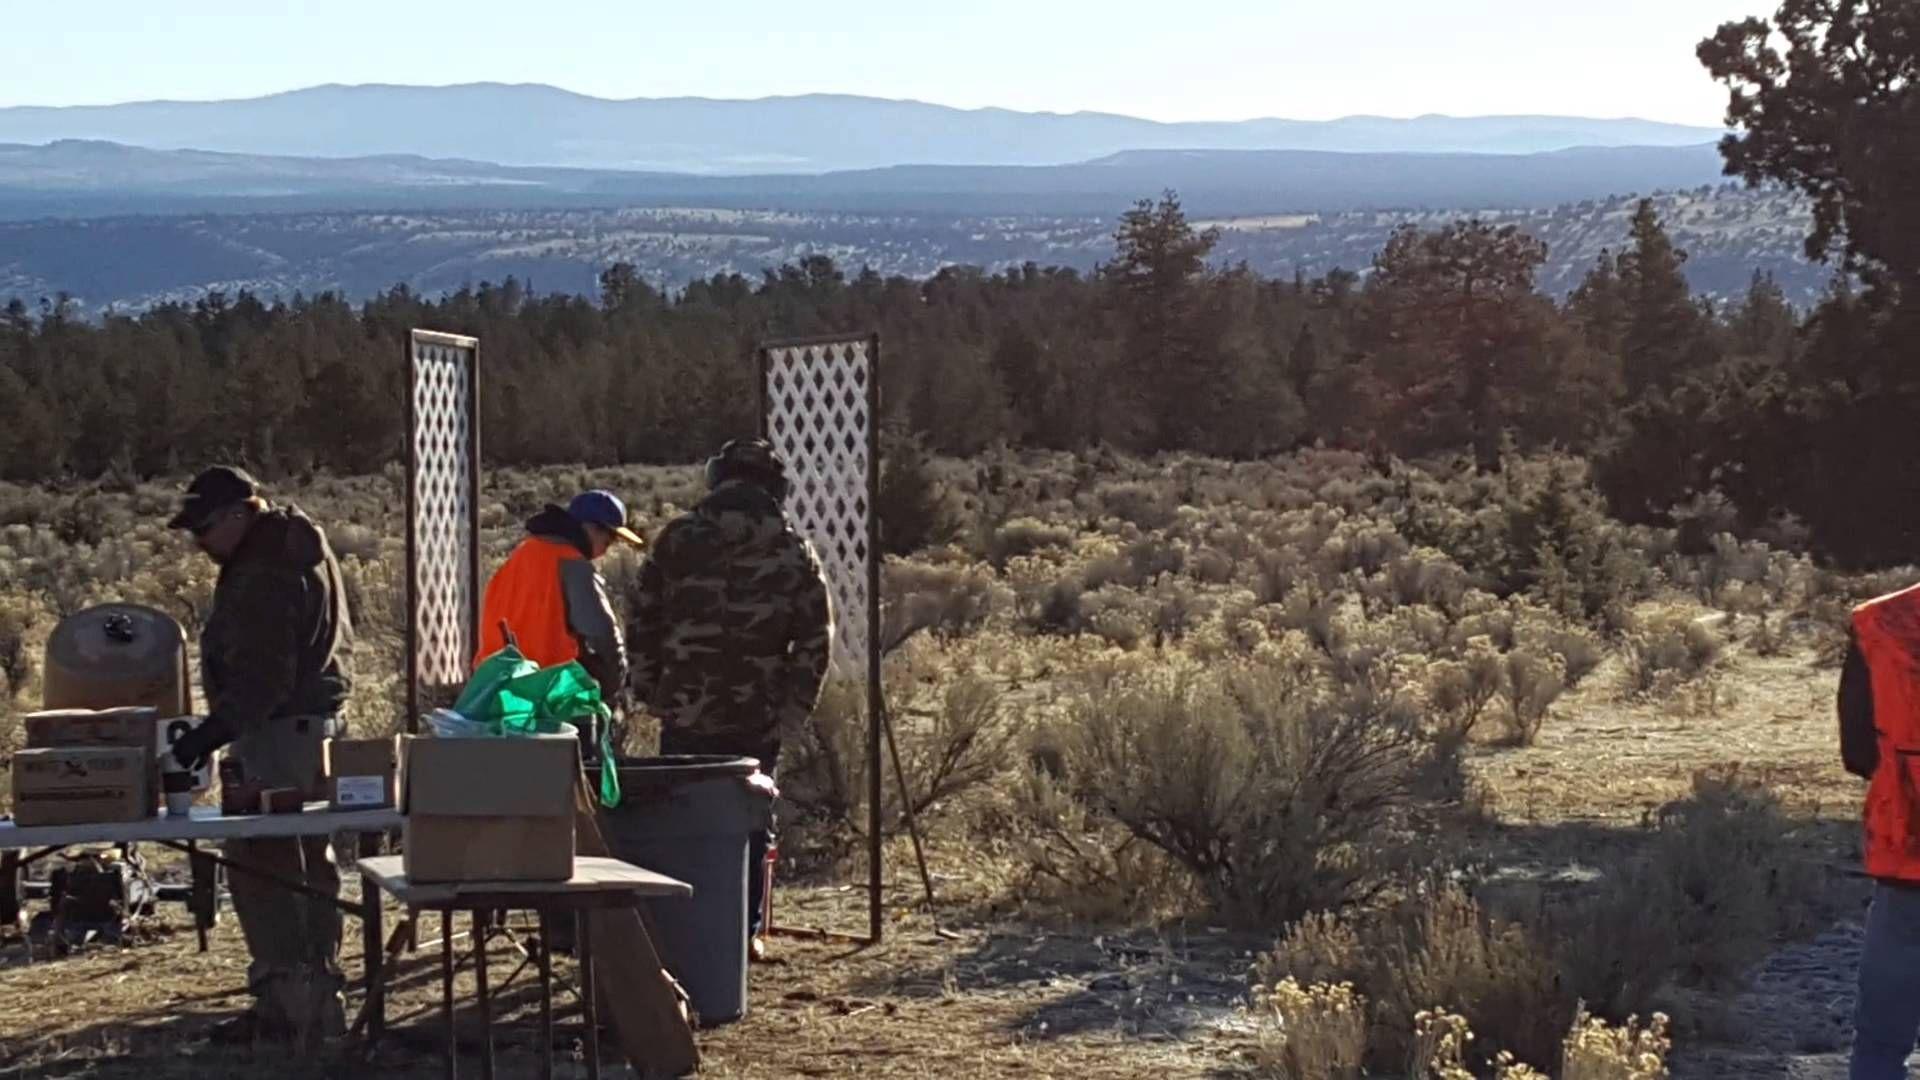 Oha youth pheasant hunt 2015